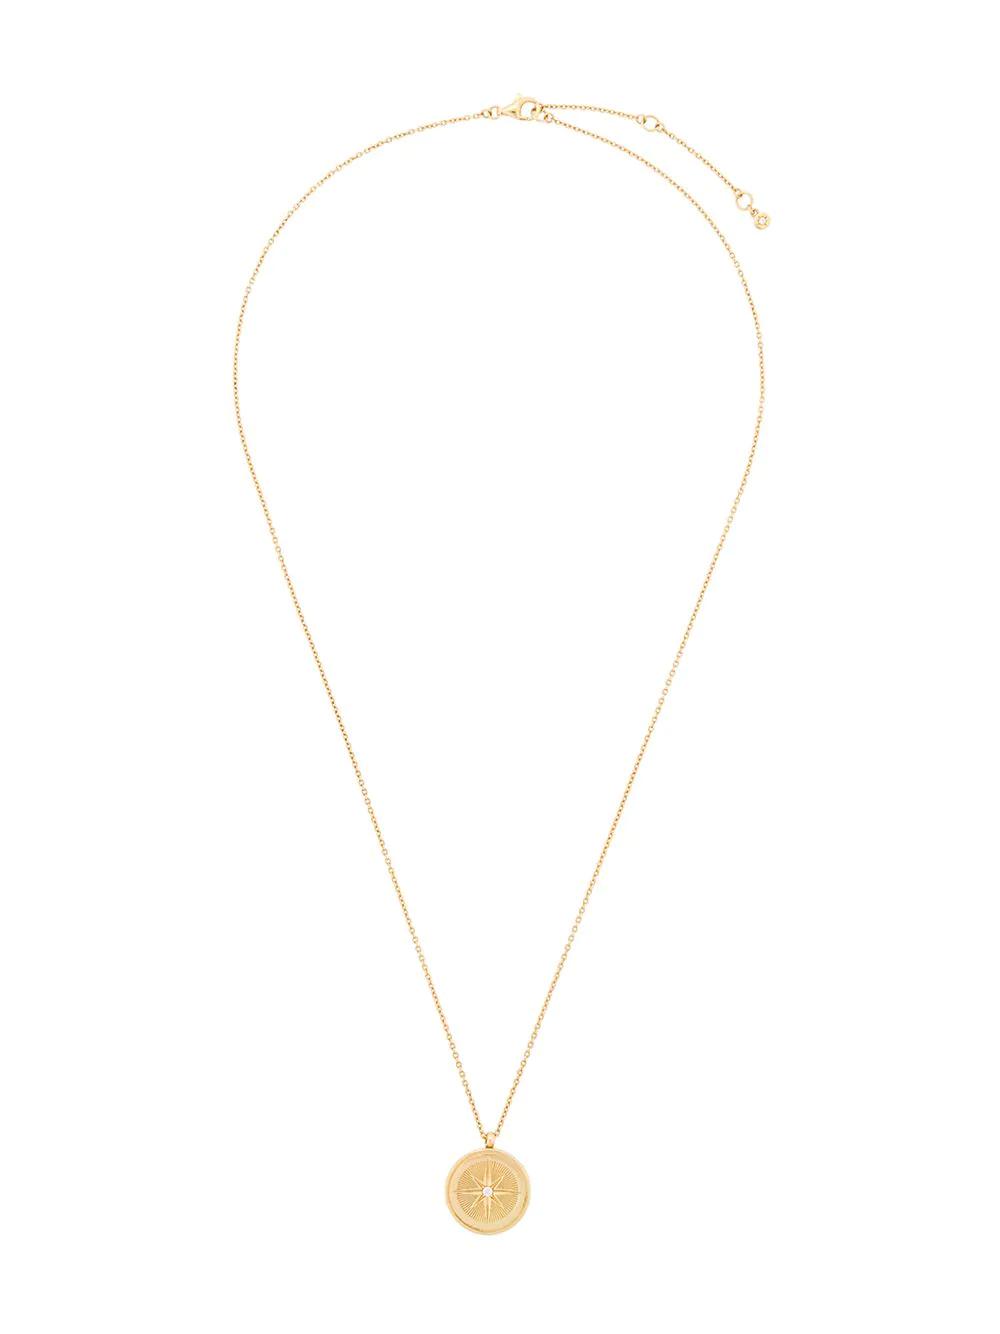 Astley Clarke | Astley Clarke колье Compass Celestial с медальоном | Clouty